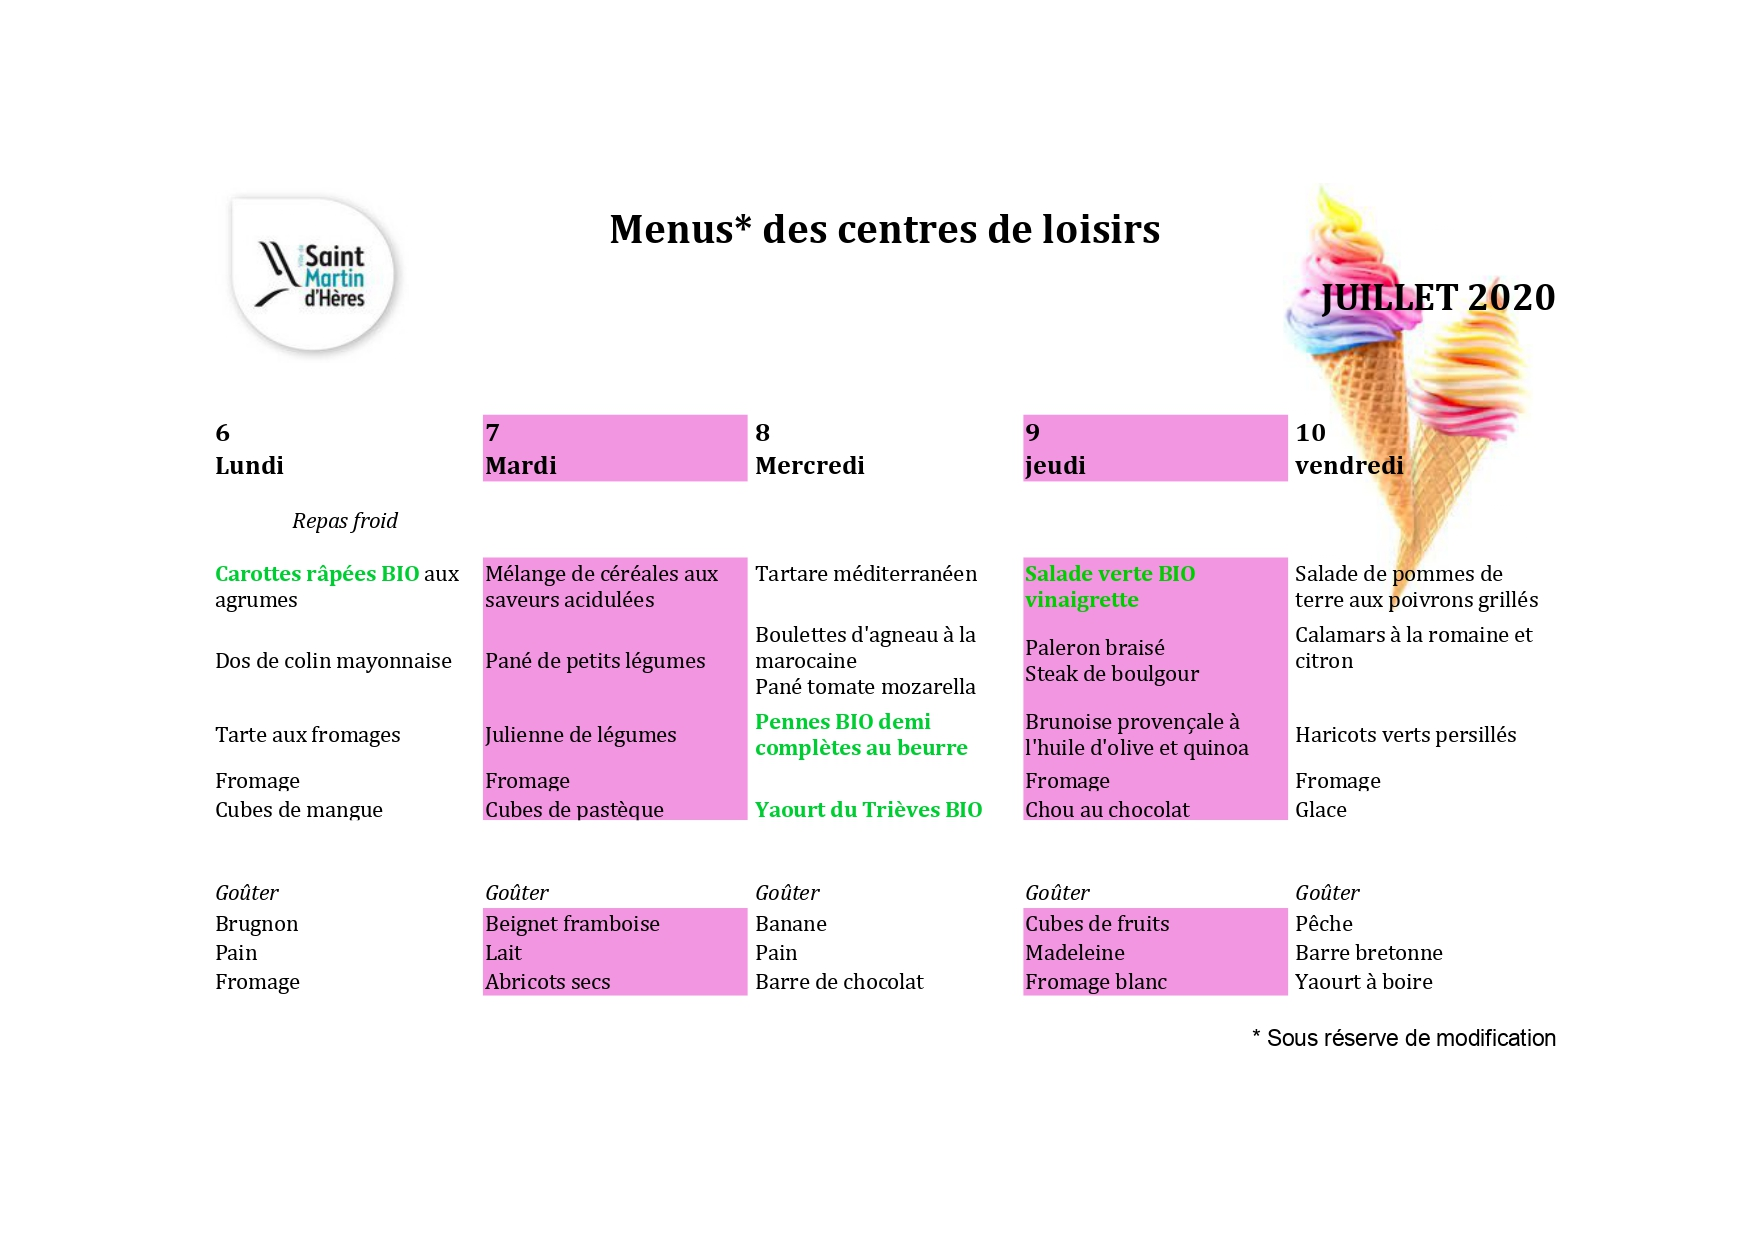 Menus centres de loisirs : juillet 2020